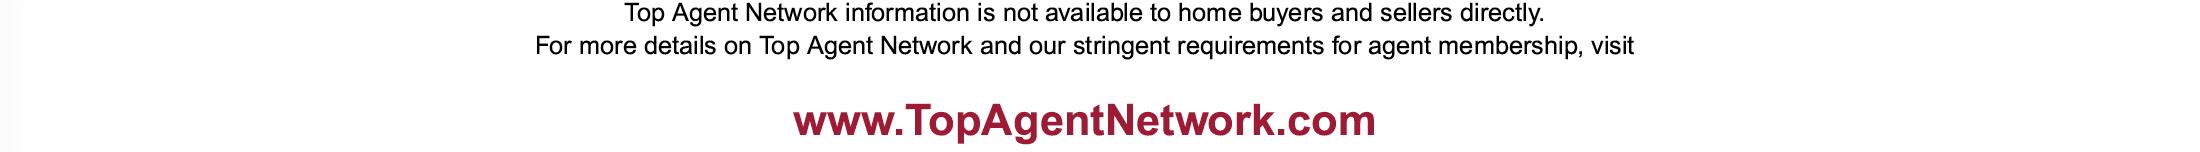 Visit Top Agent Network